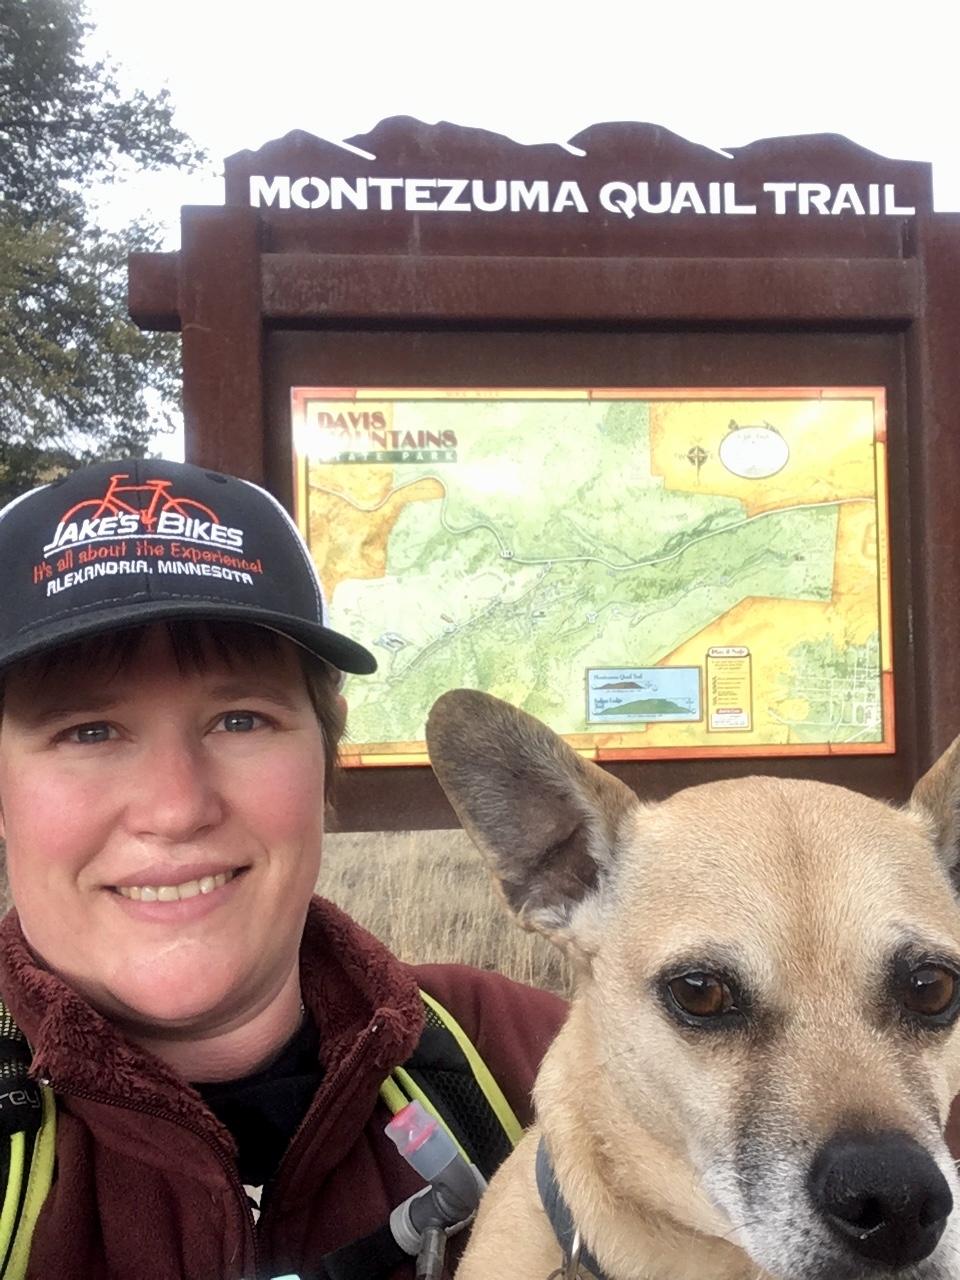 exiting Montezuma Quail